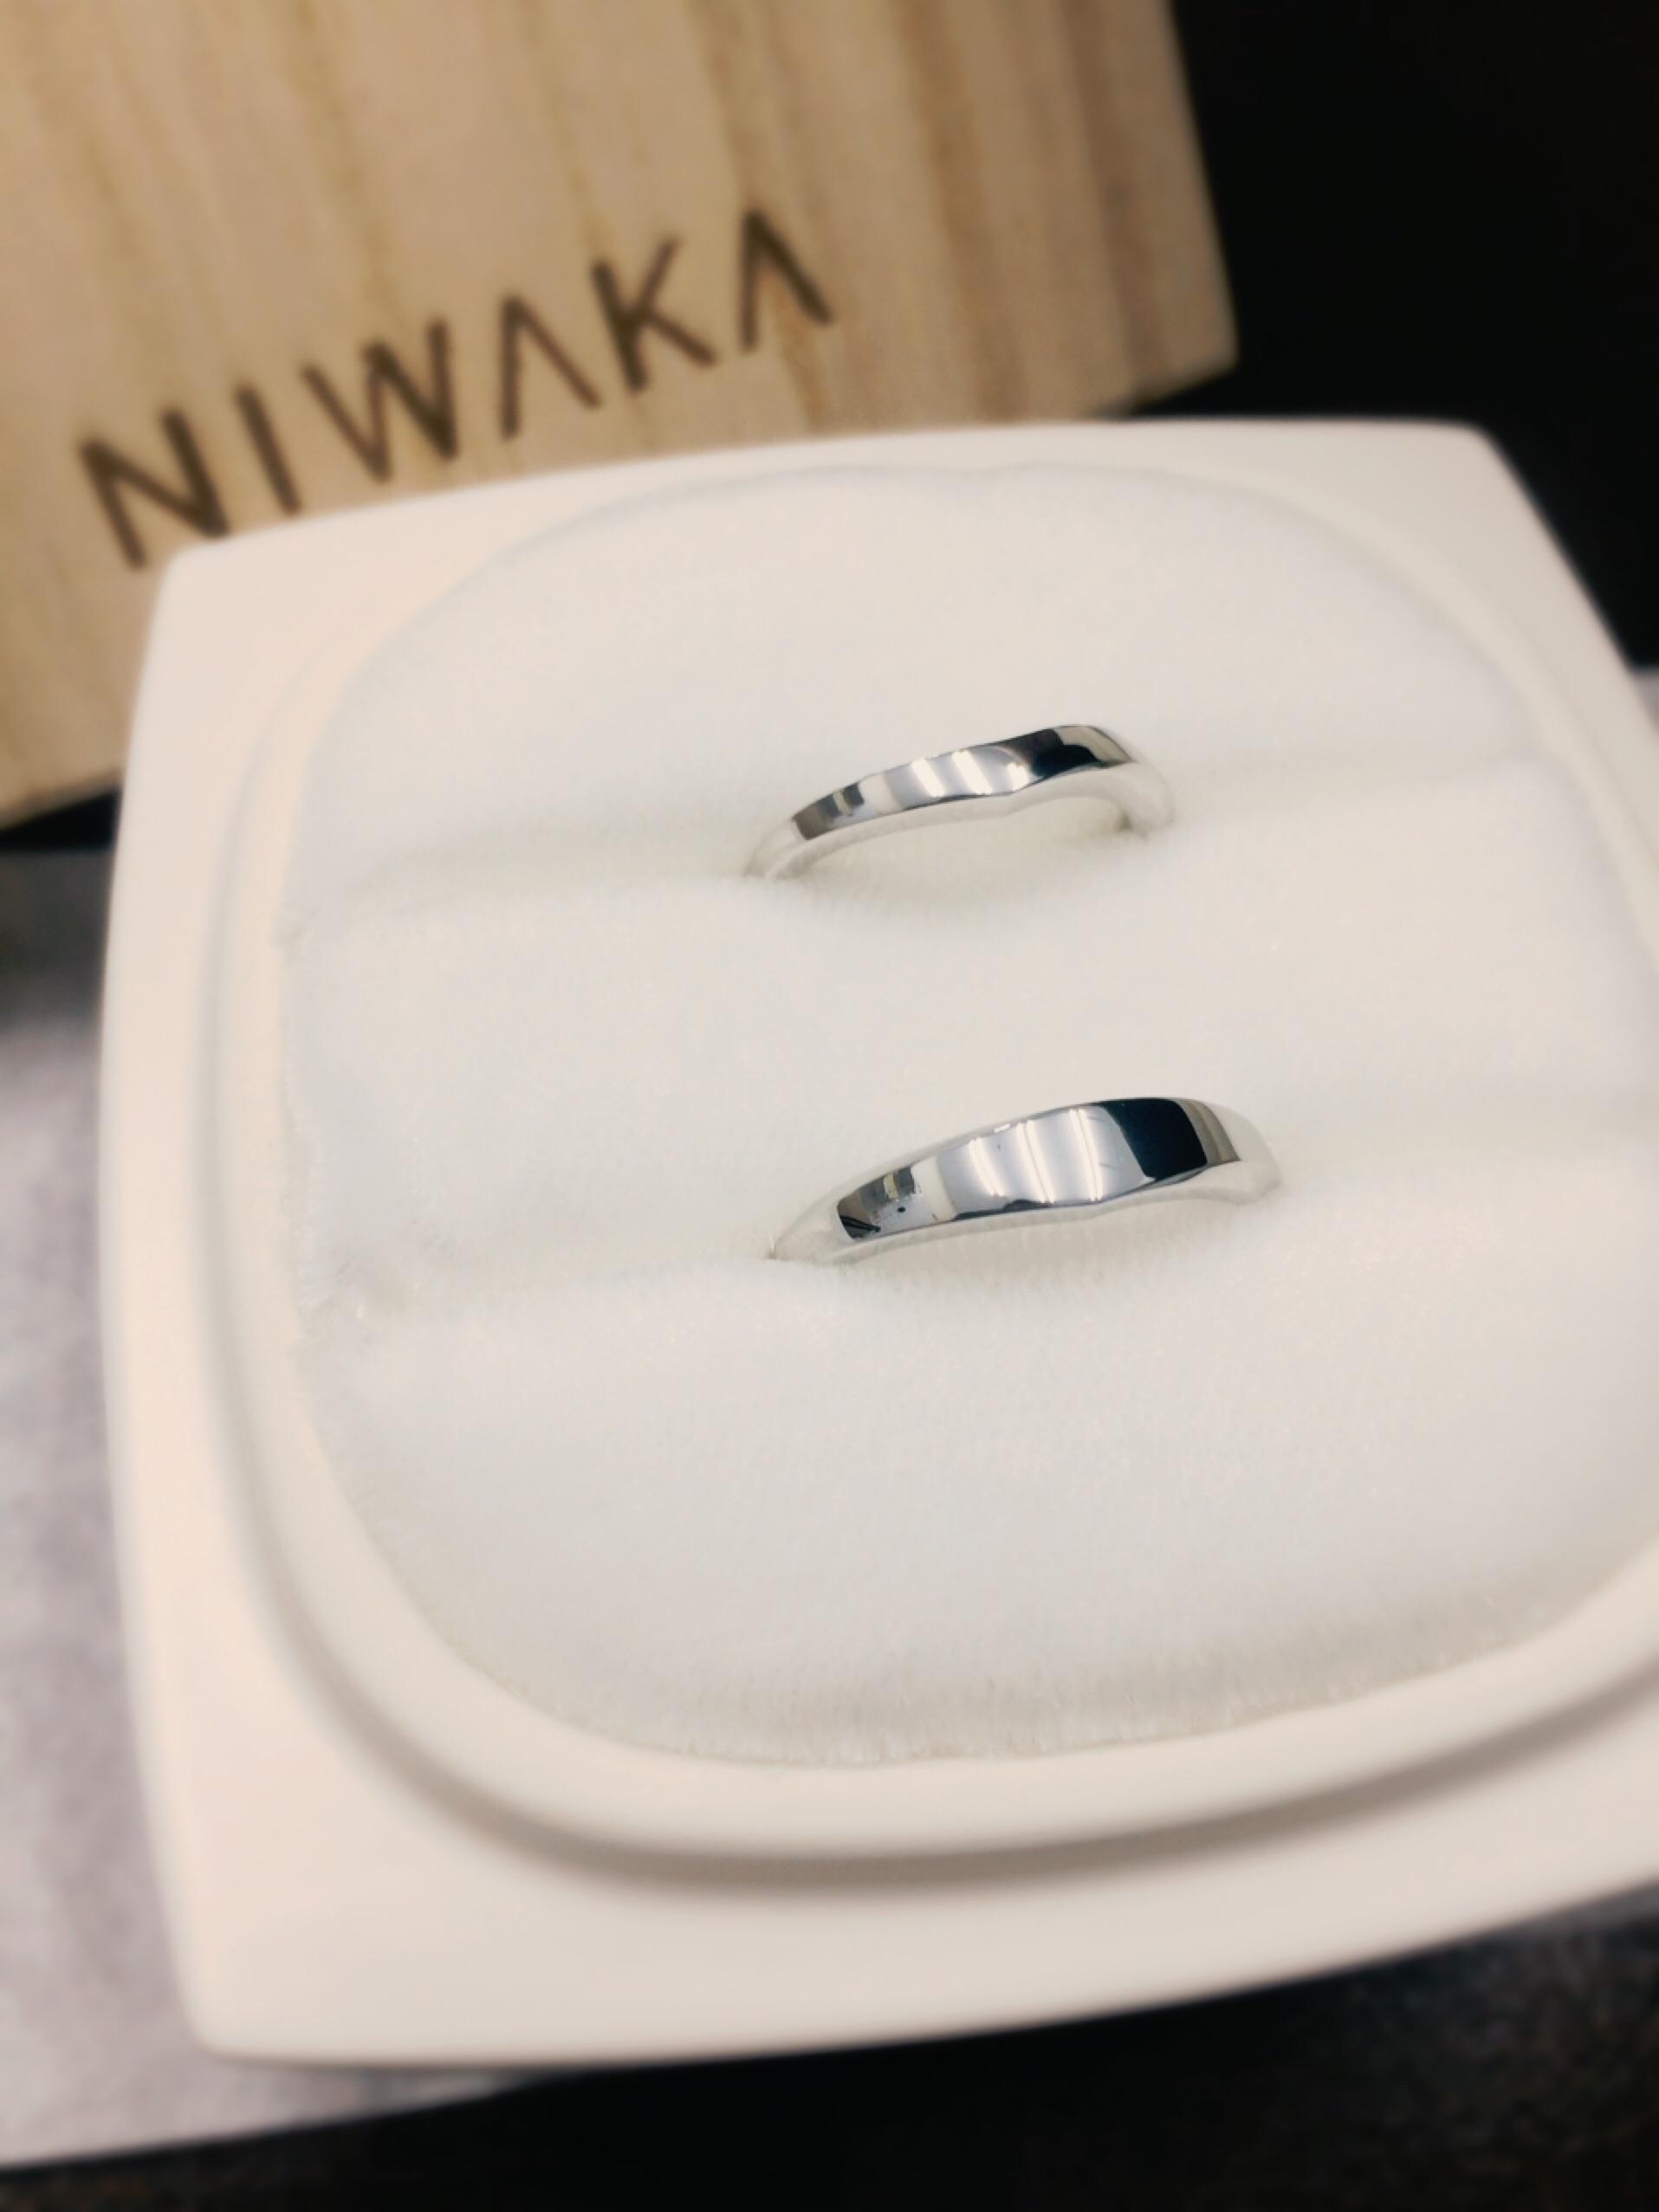 NIWAKA(にわか)の結婚指輪「水鏡」をご成約(佐渡市/M様ご夫婦)